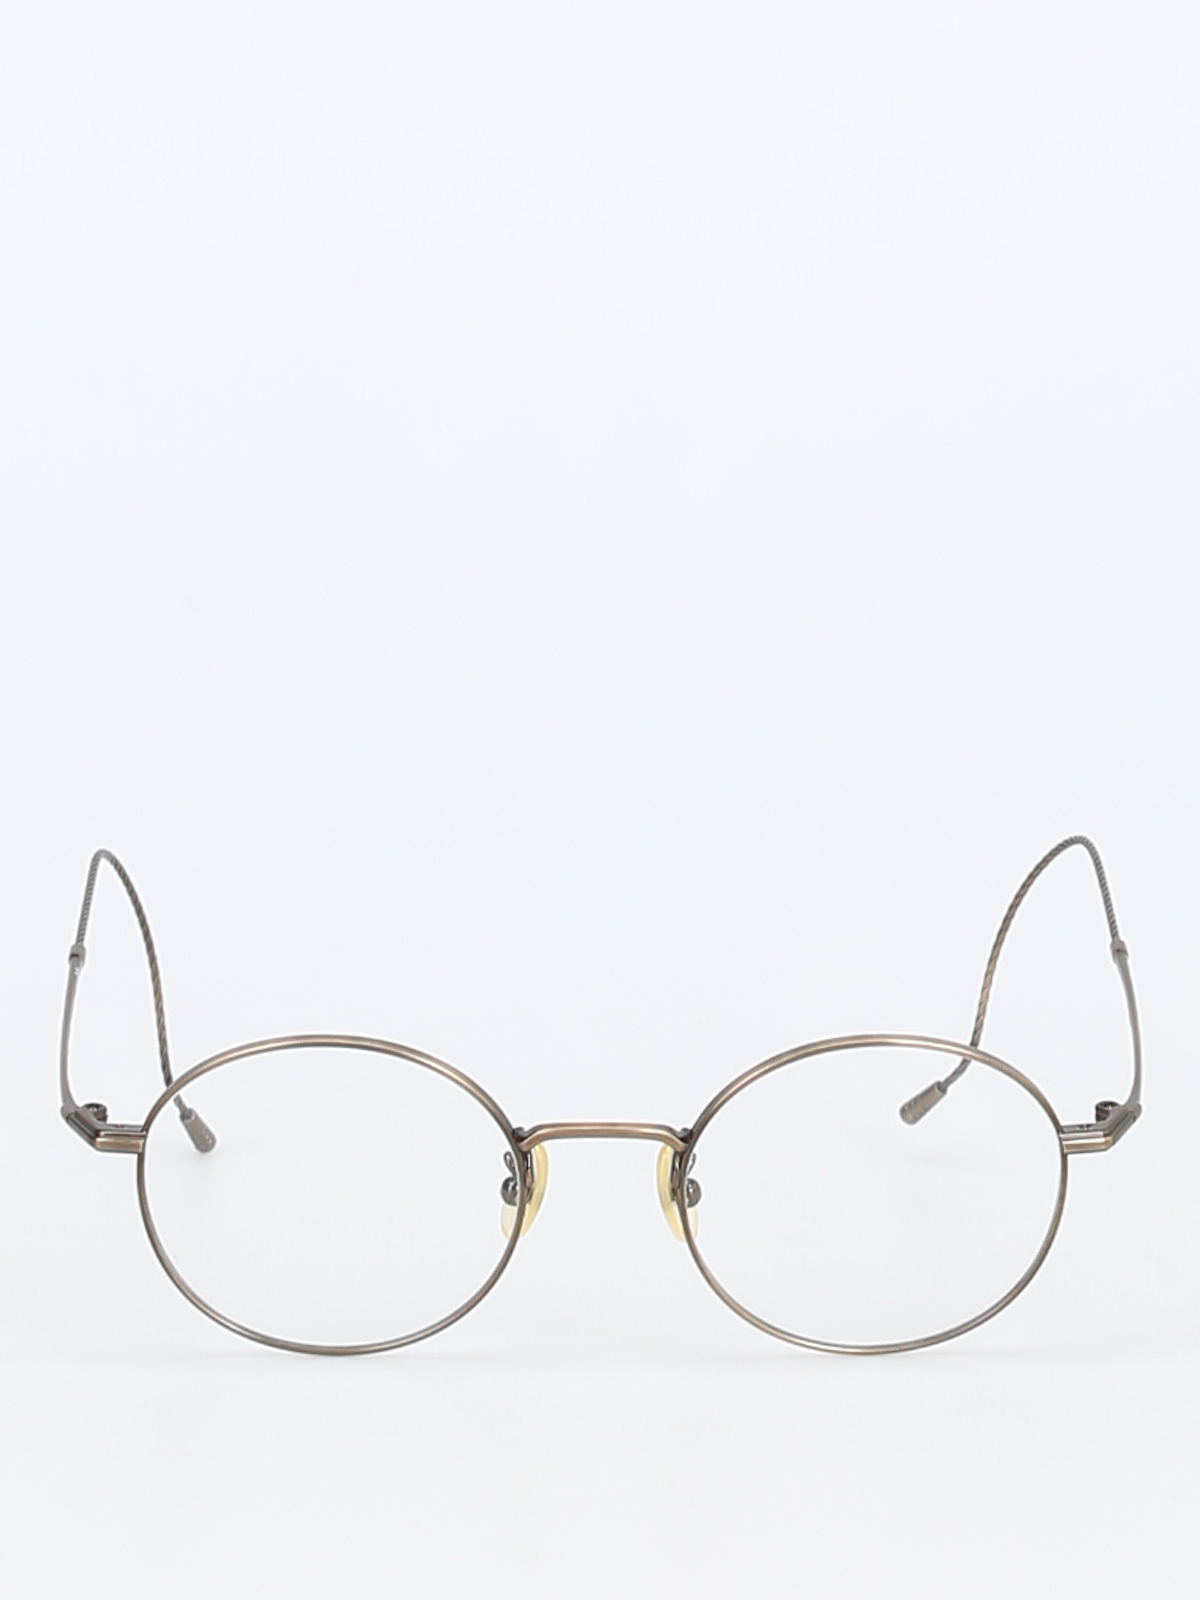 25ea2d0784 999.9 four nines - Metal thin round frame eyeglasses - glasses - S-180T3